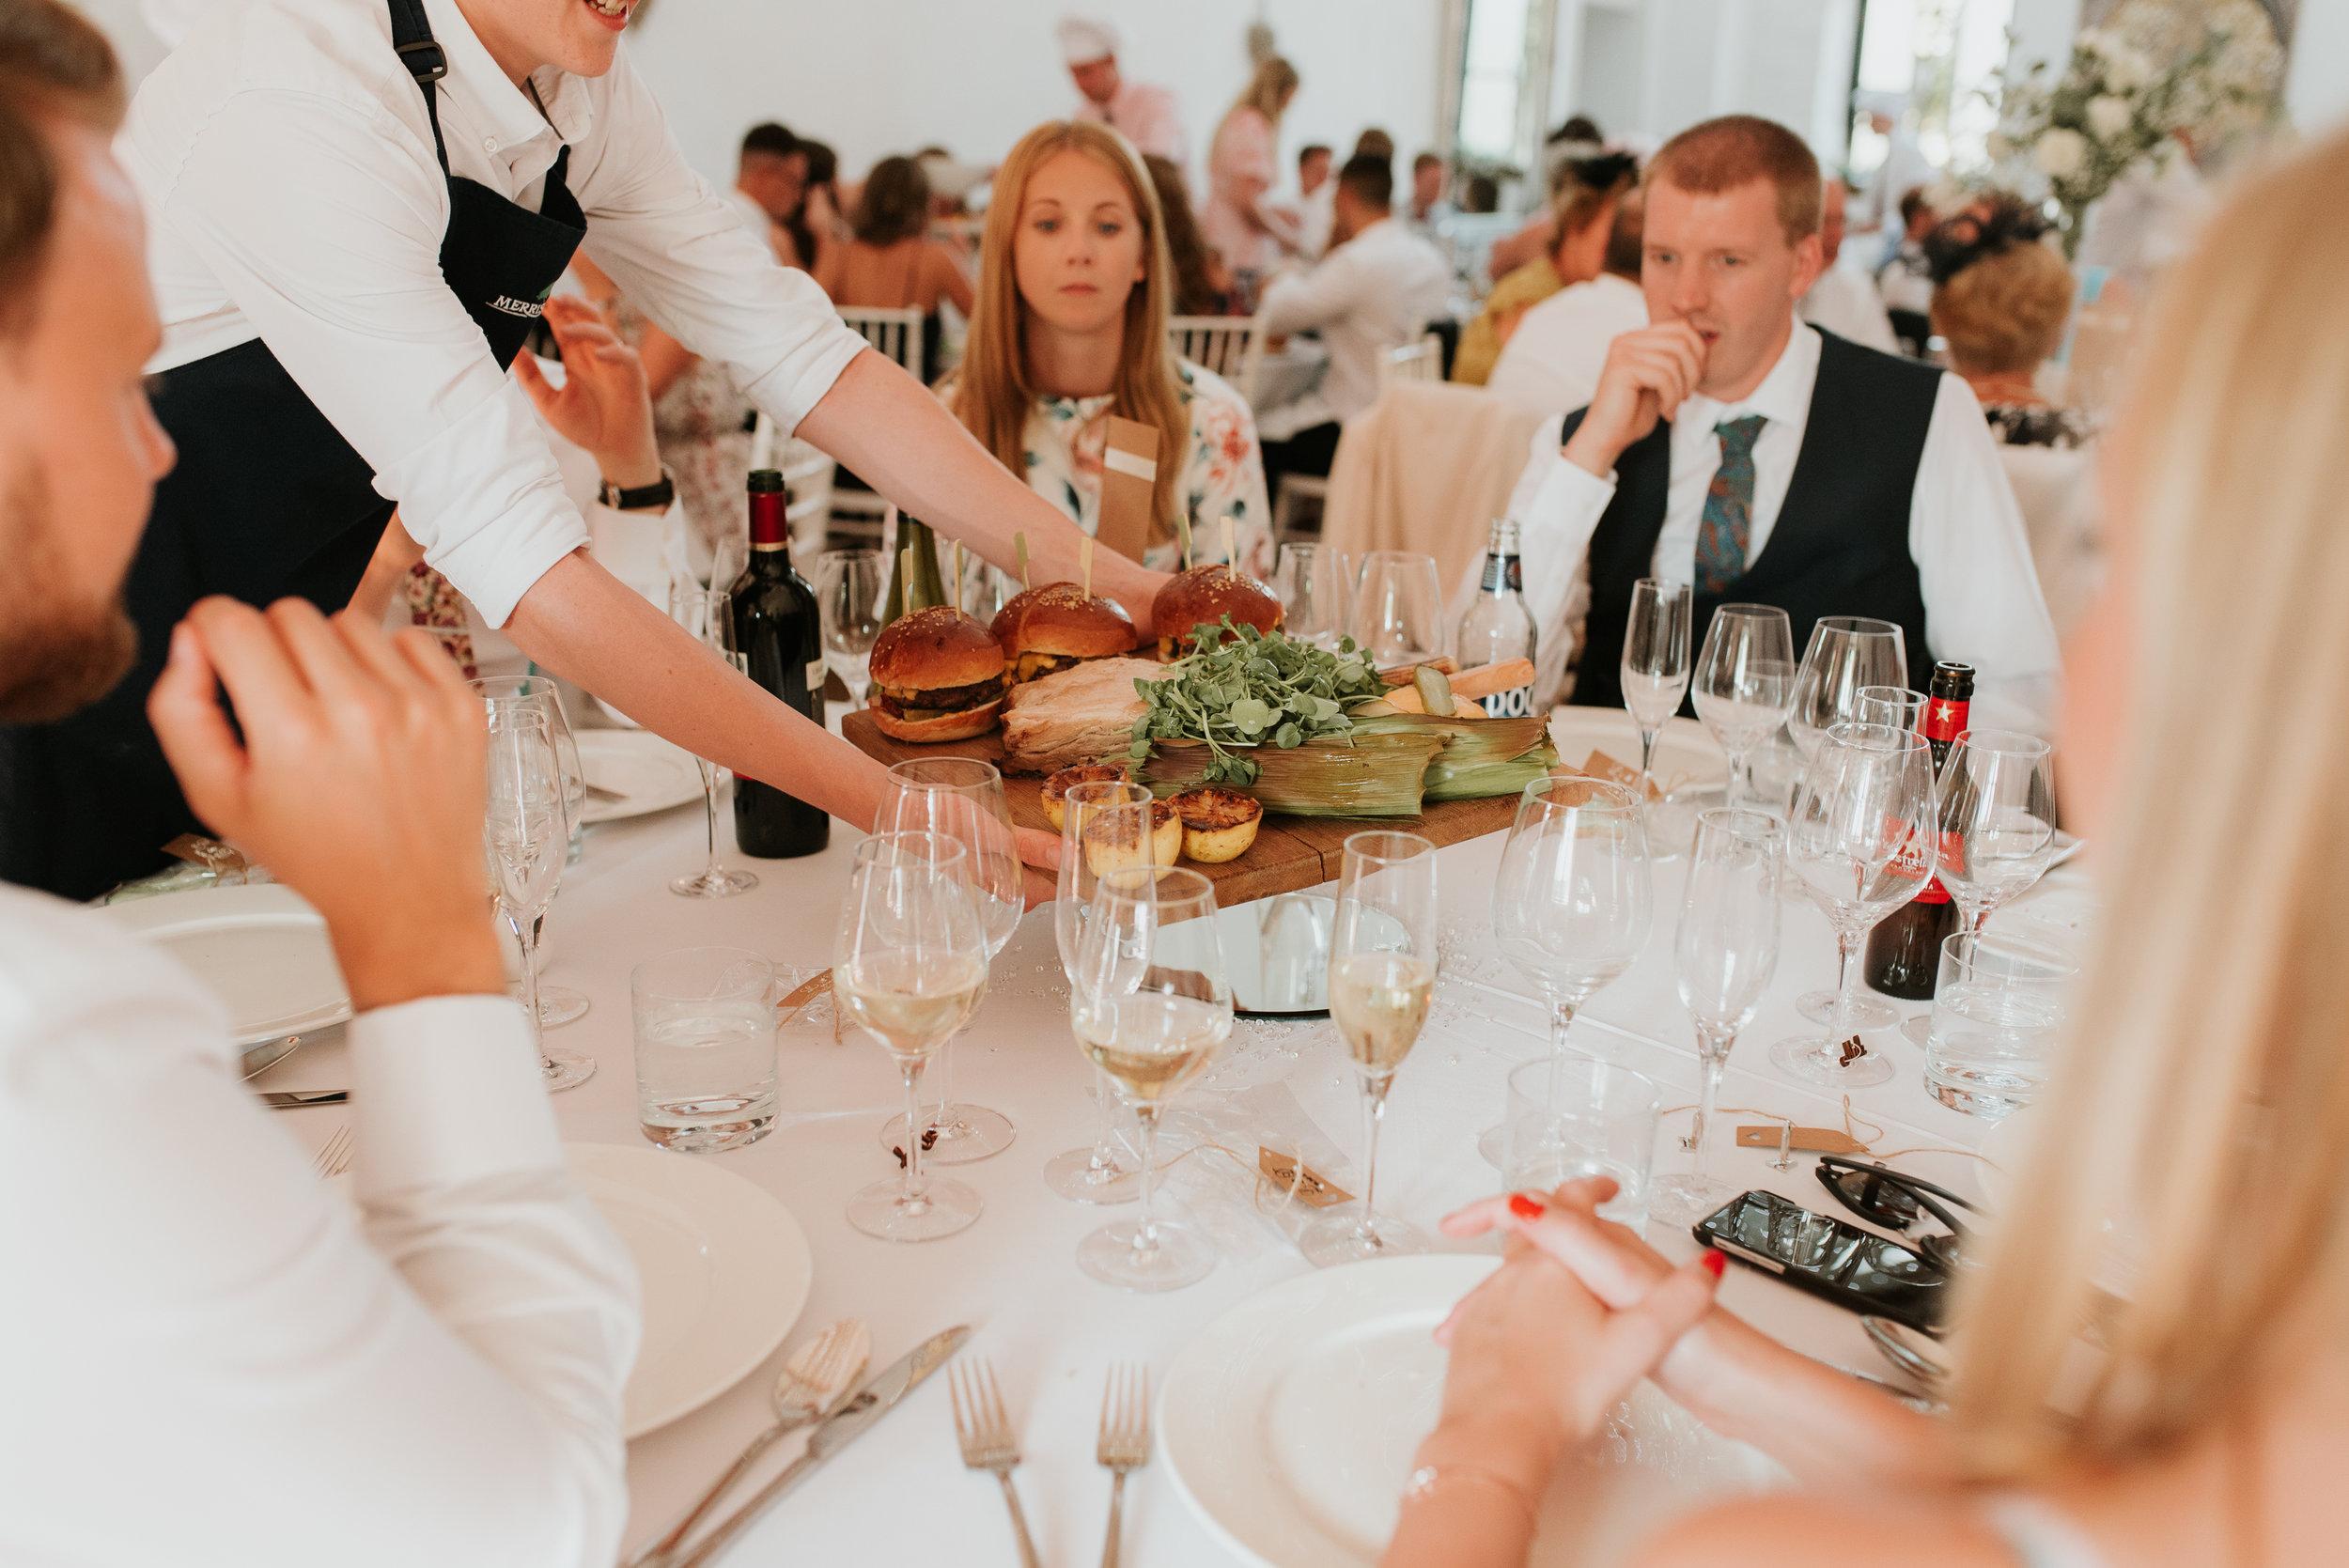 Oxfordshire-wedding-photographer-63.jpg